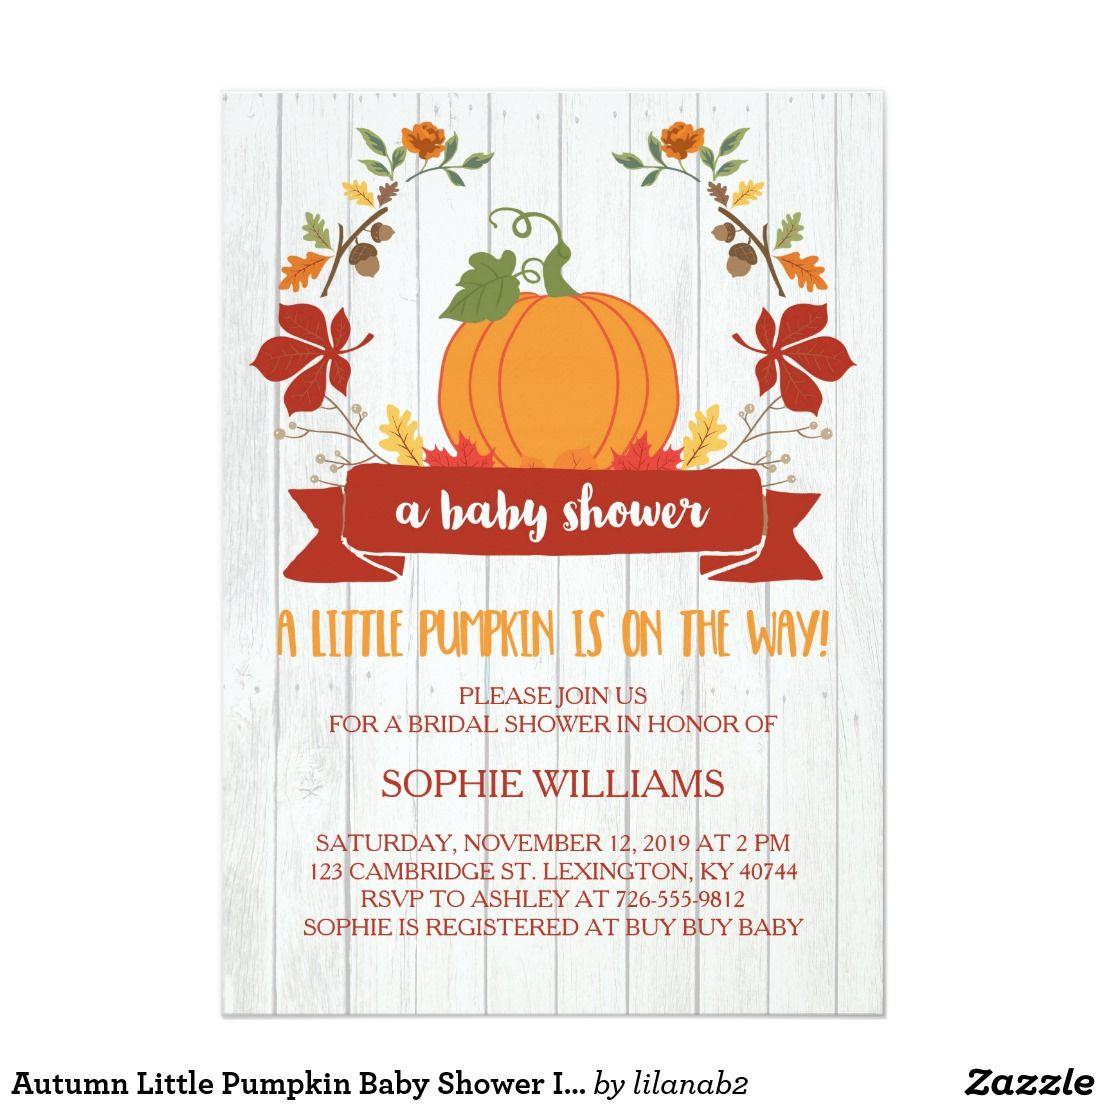 Autumn Little Pumpkin Baby Shower Invitation | Light wood texture ...